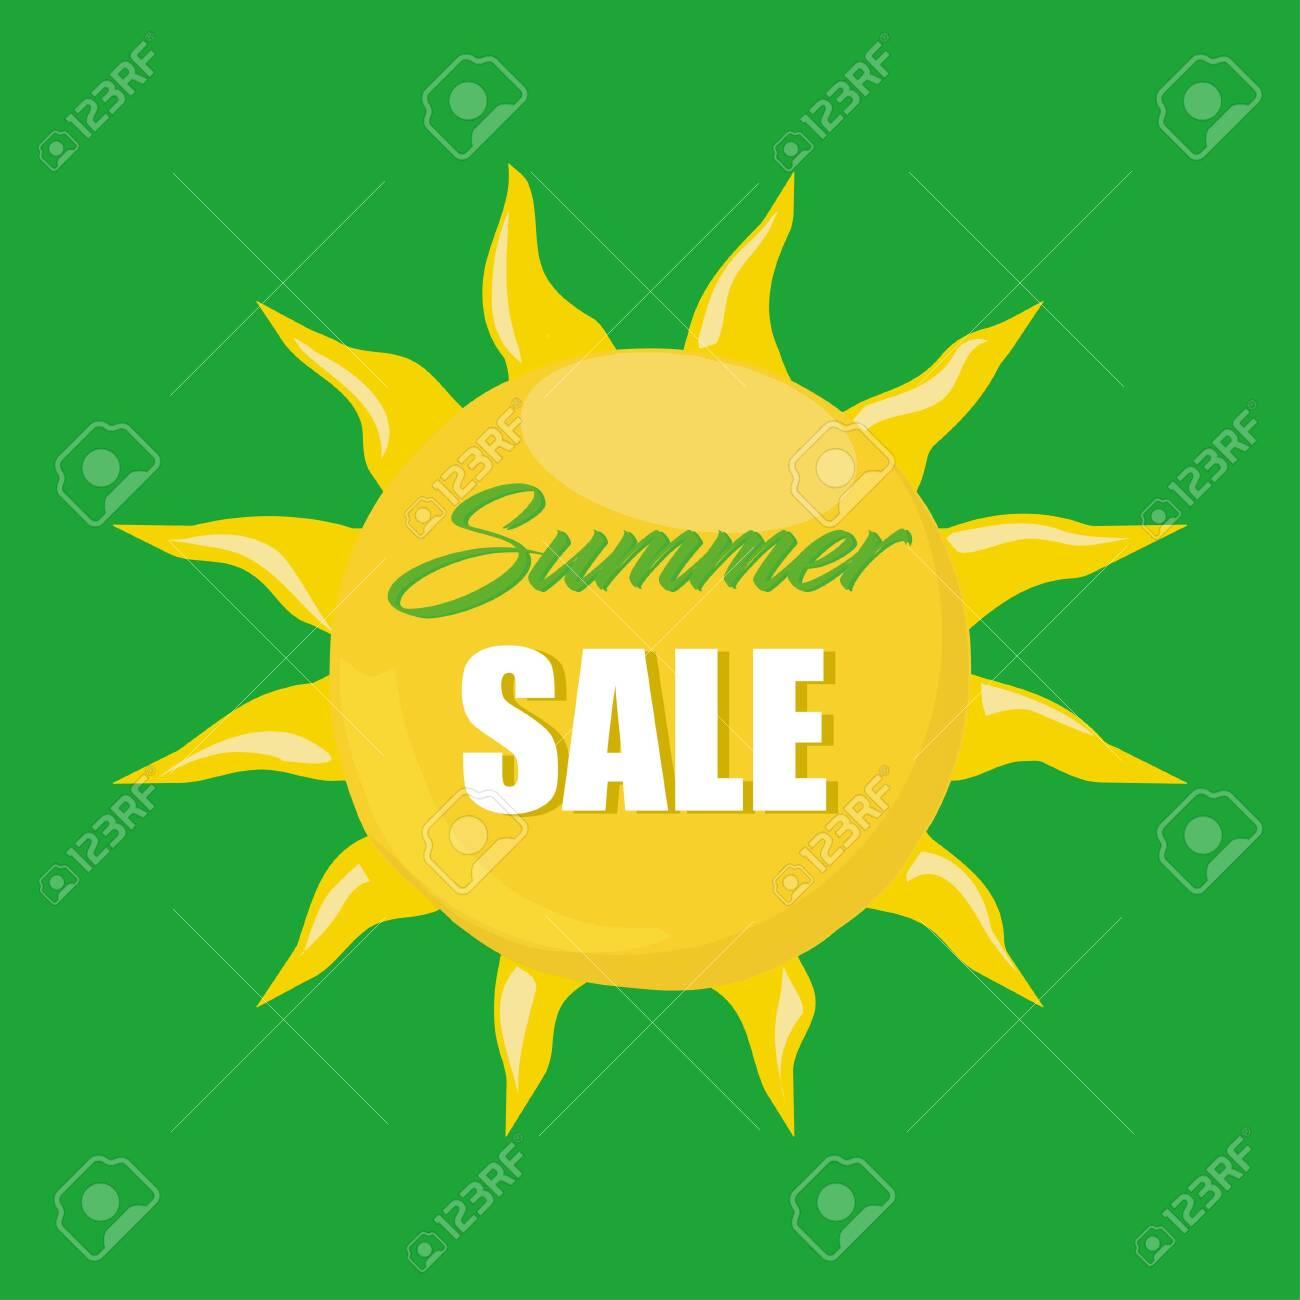 Summer sale banner. Design for banner, flyer, invitation, poster, web site or greeting card. - 146957669